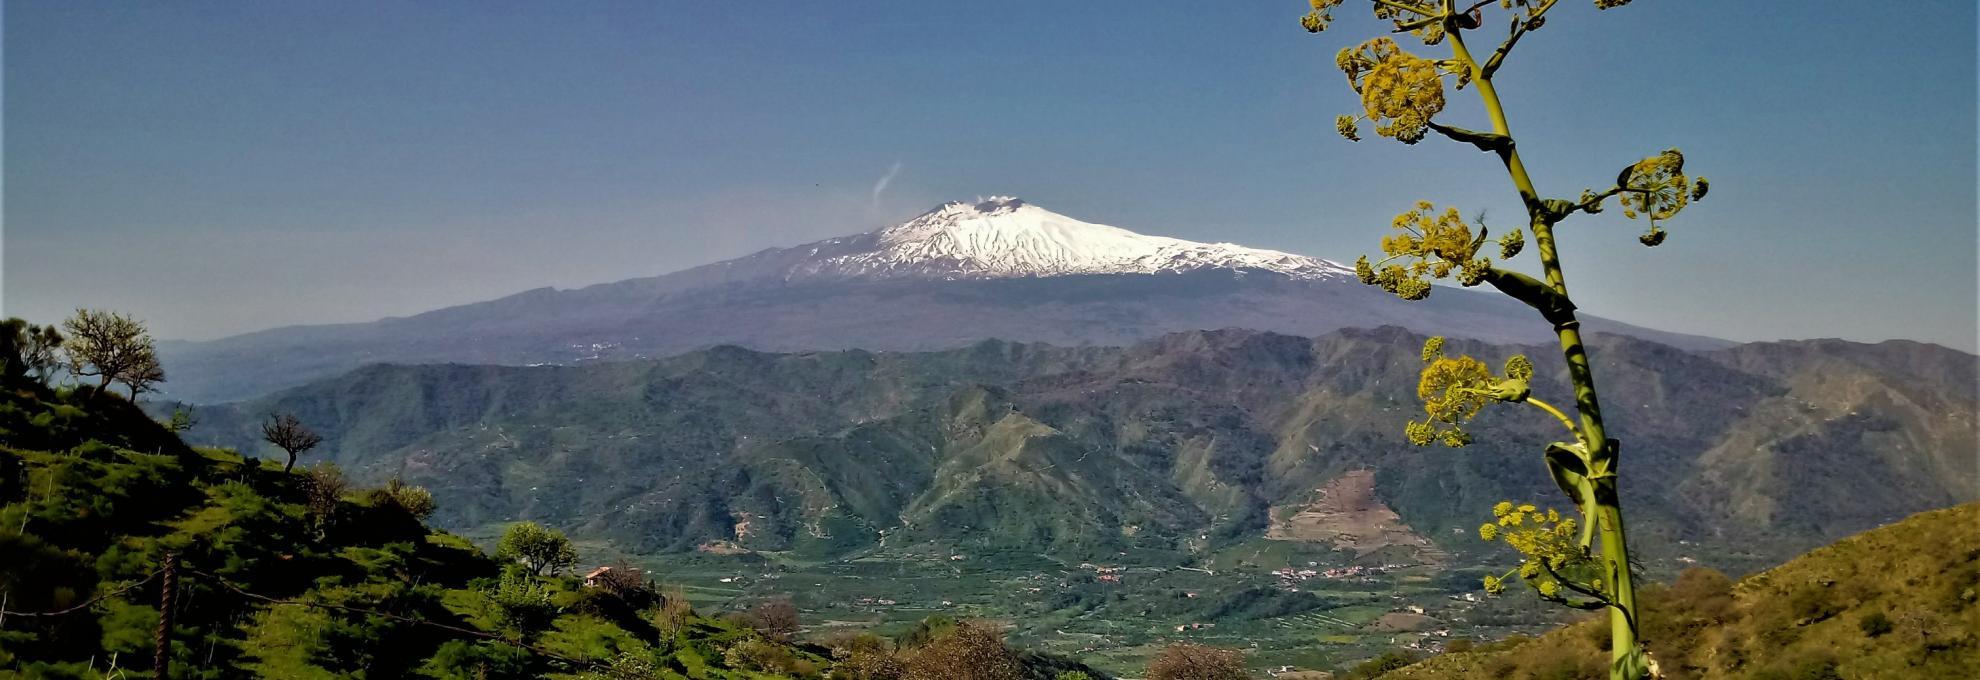 A sicilian Landscape